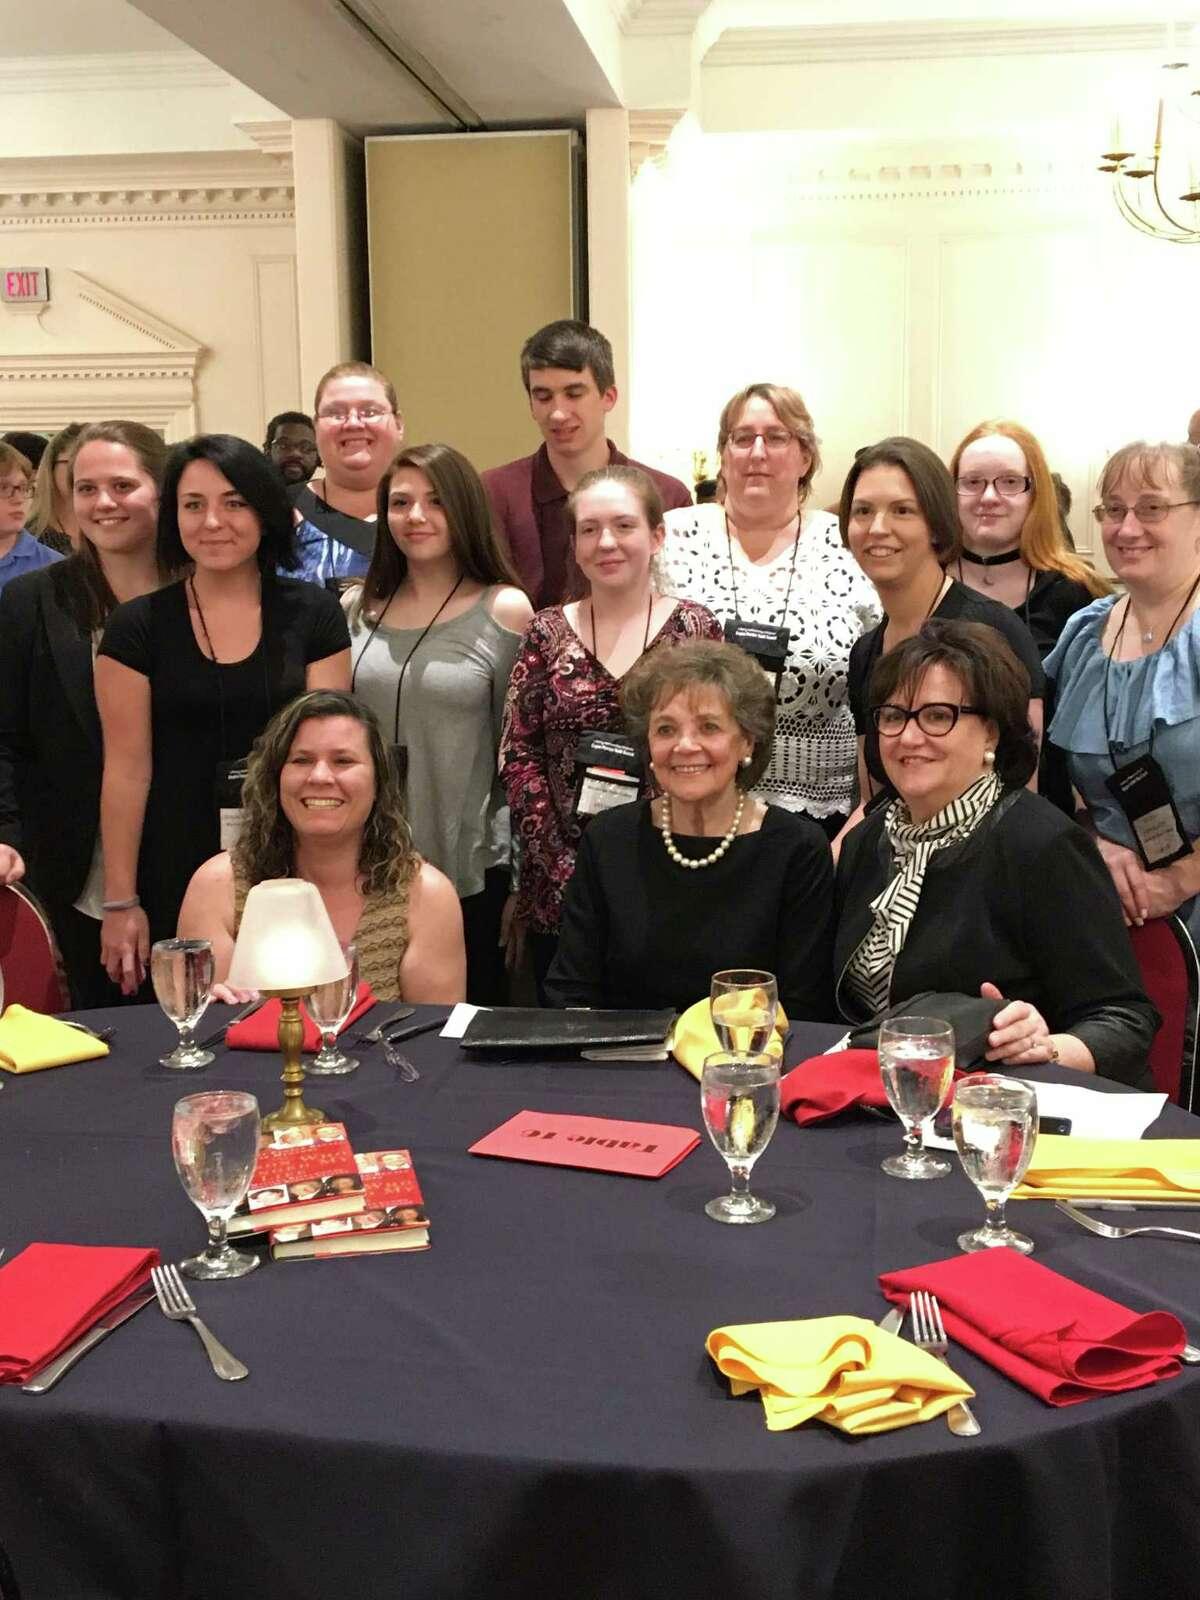 Matilda Raffa Cuomo, center, receives the Liberty Partnerships Program Lifetime Achievement Award Friday night in Colonie. (Photo provided)